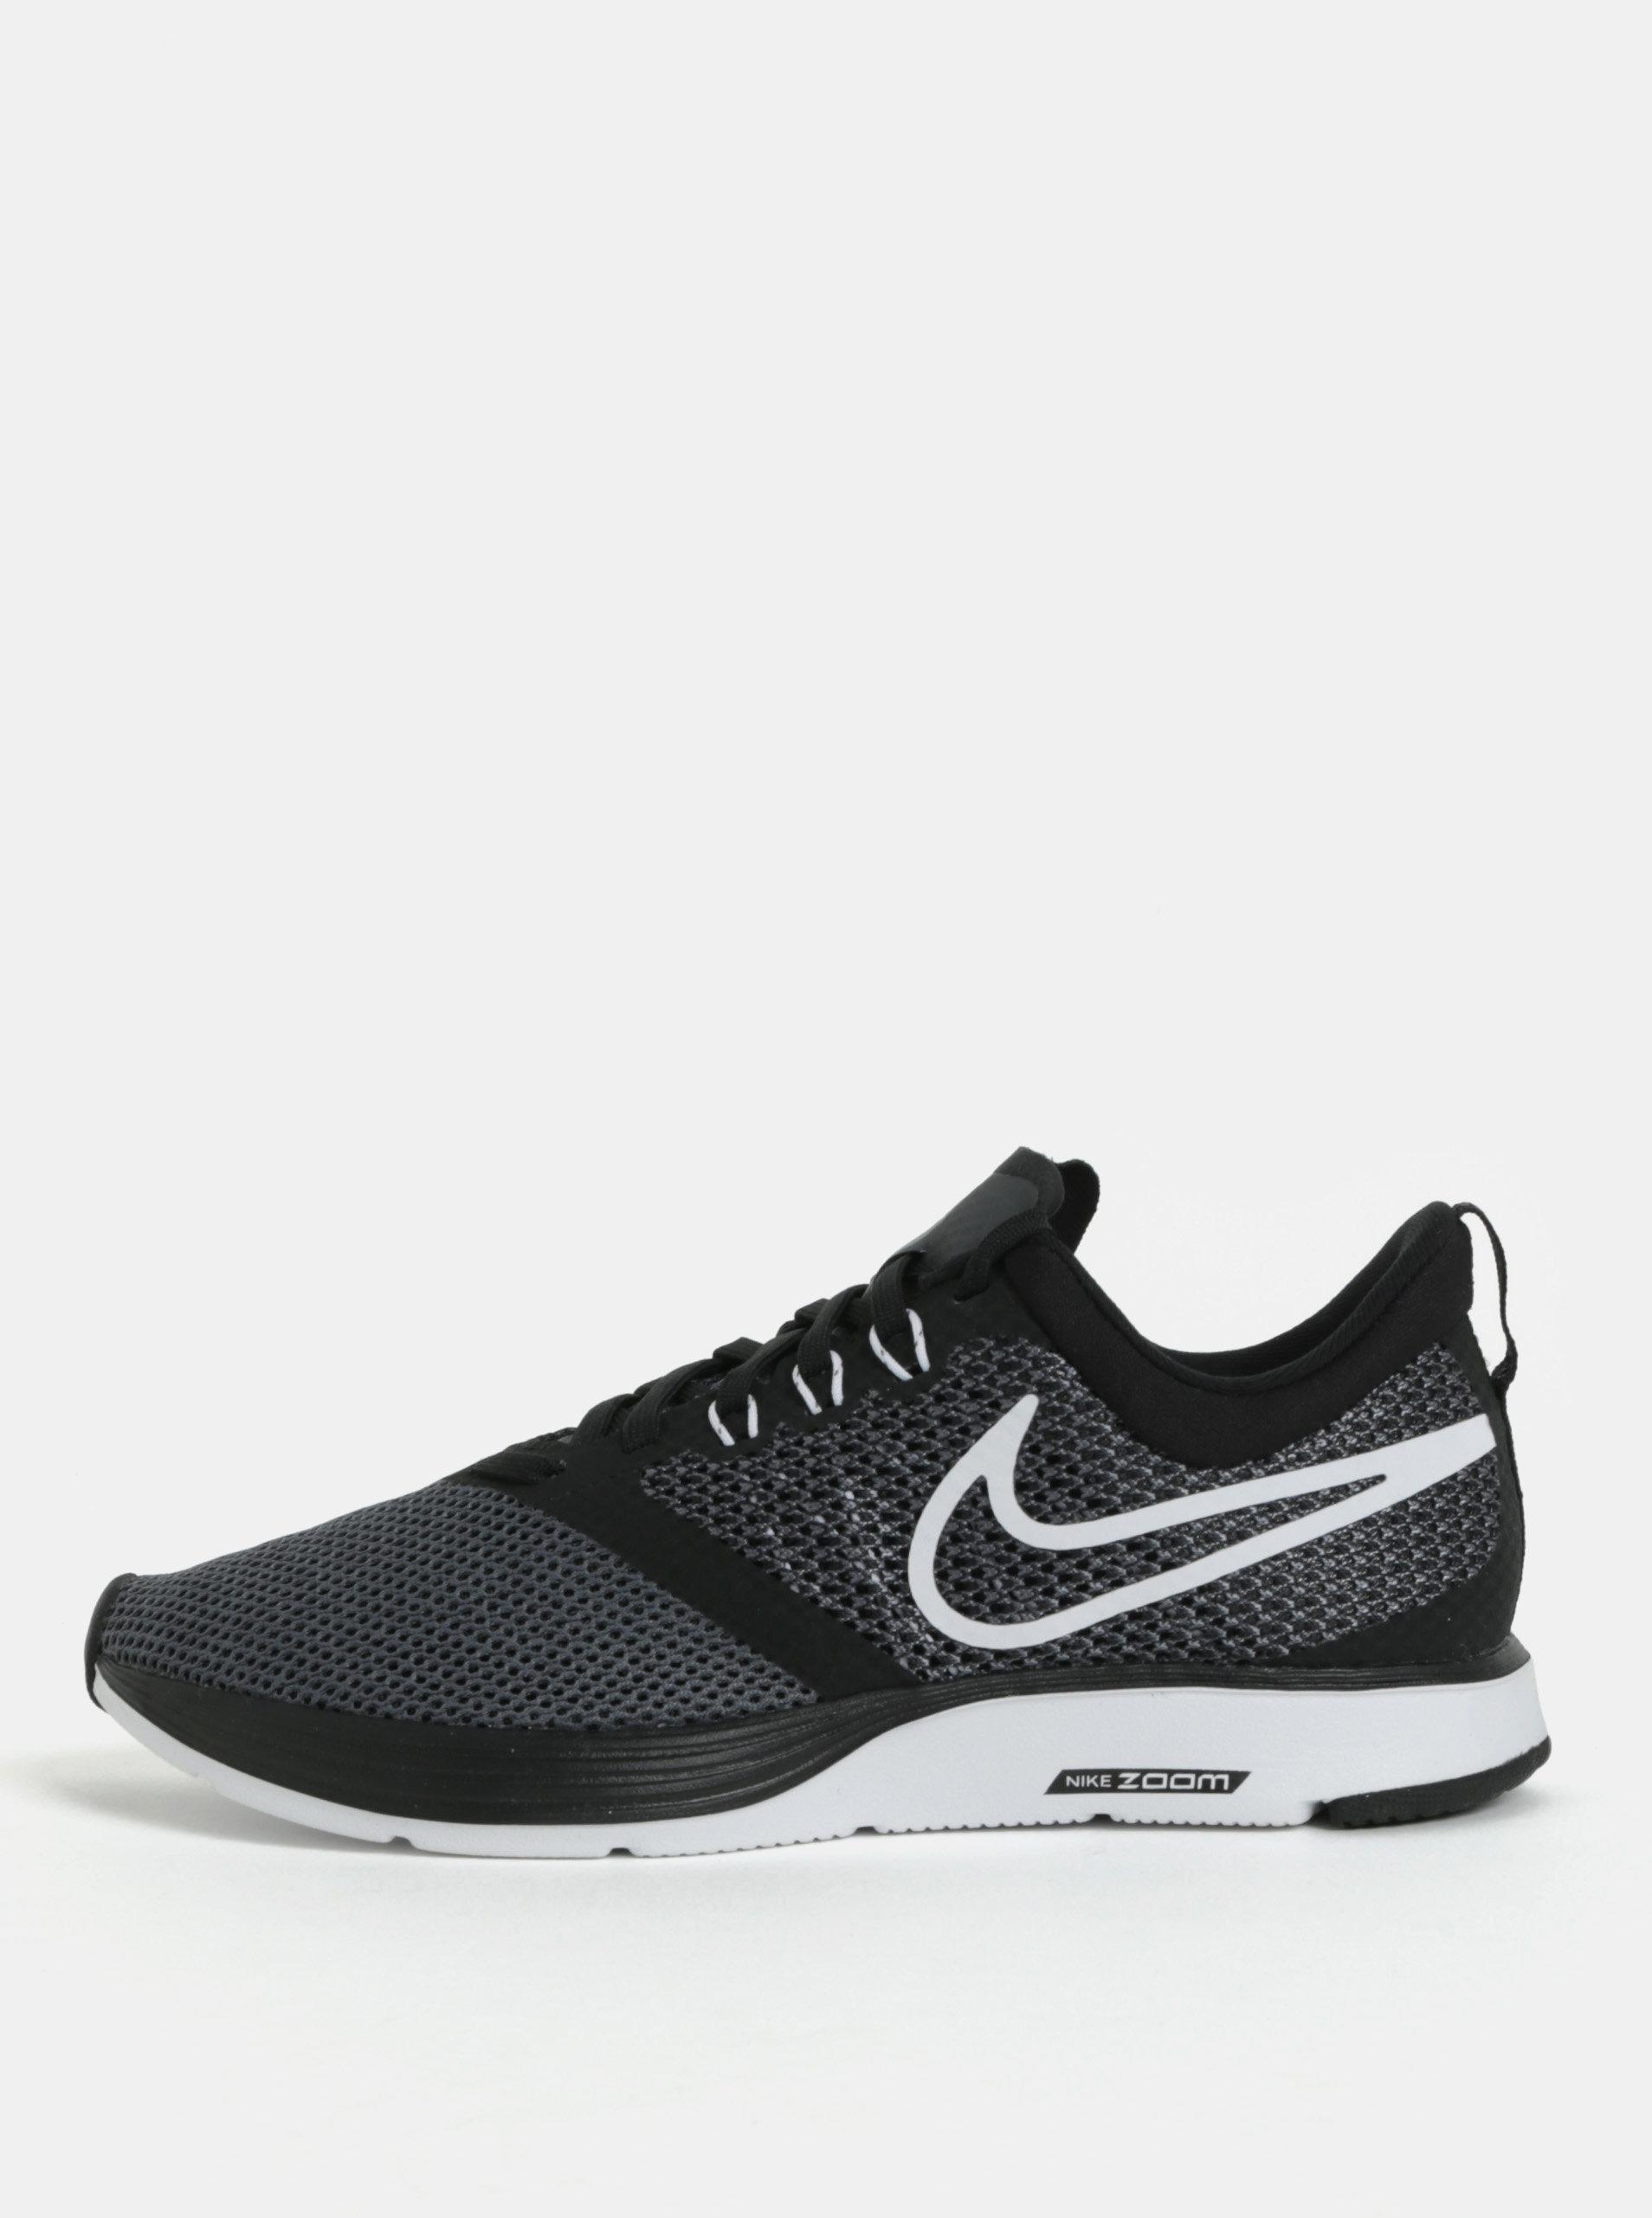 Zeleno–čierne dámske tenisky Nike Zoom Strike ... 2223160fe8a